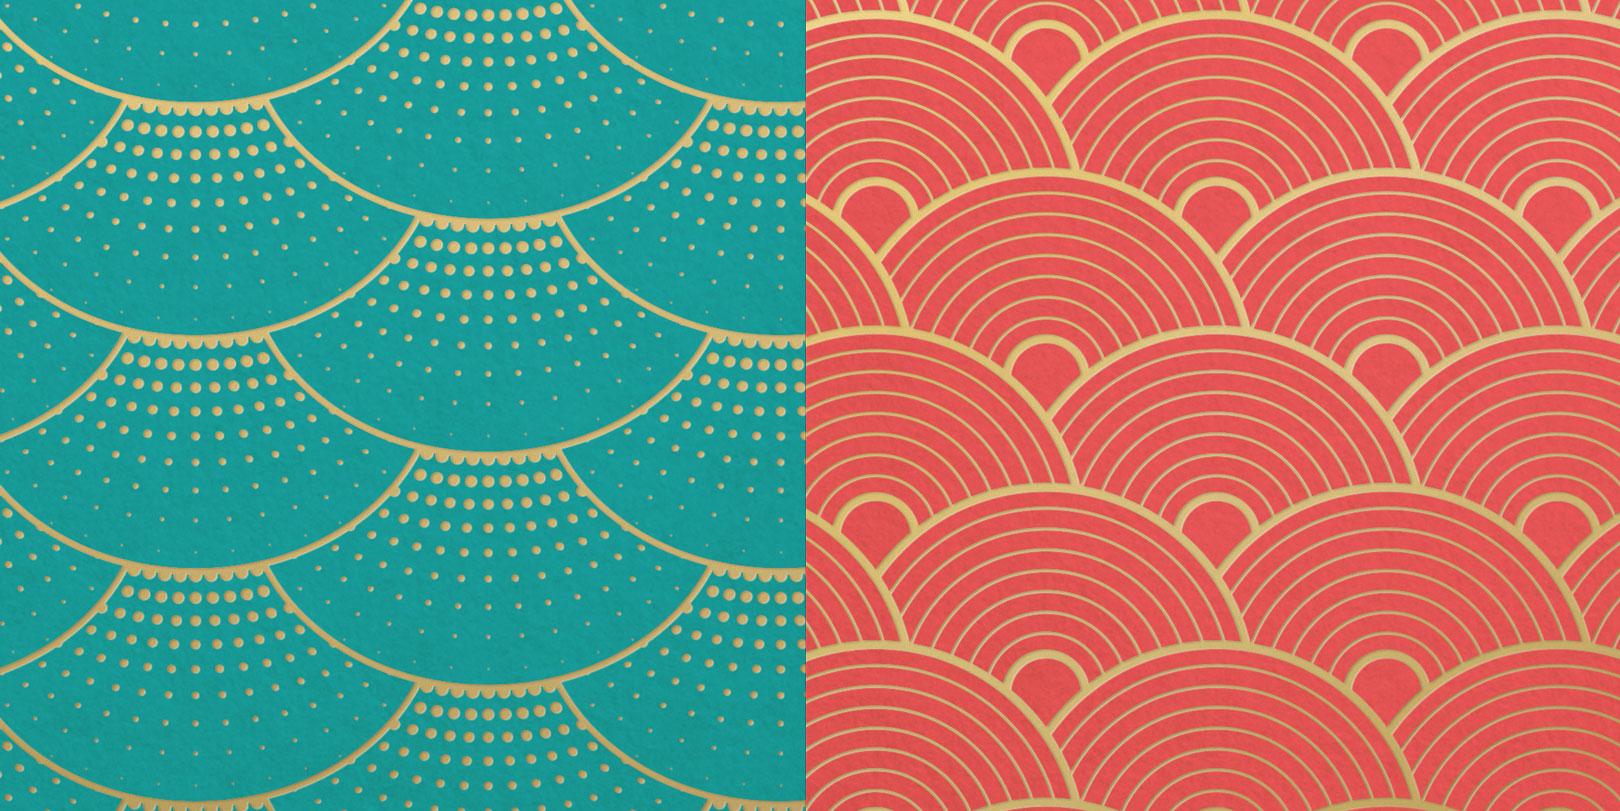 Inverawe_pattern